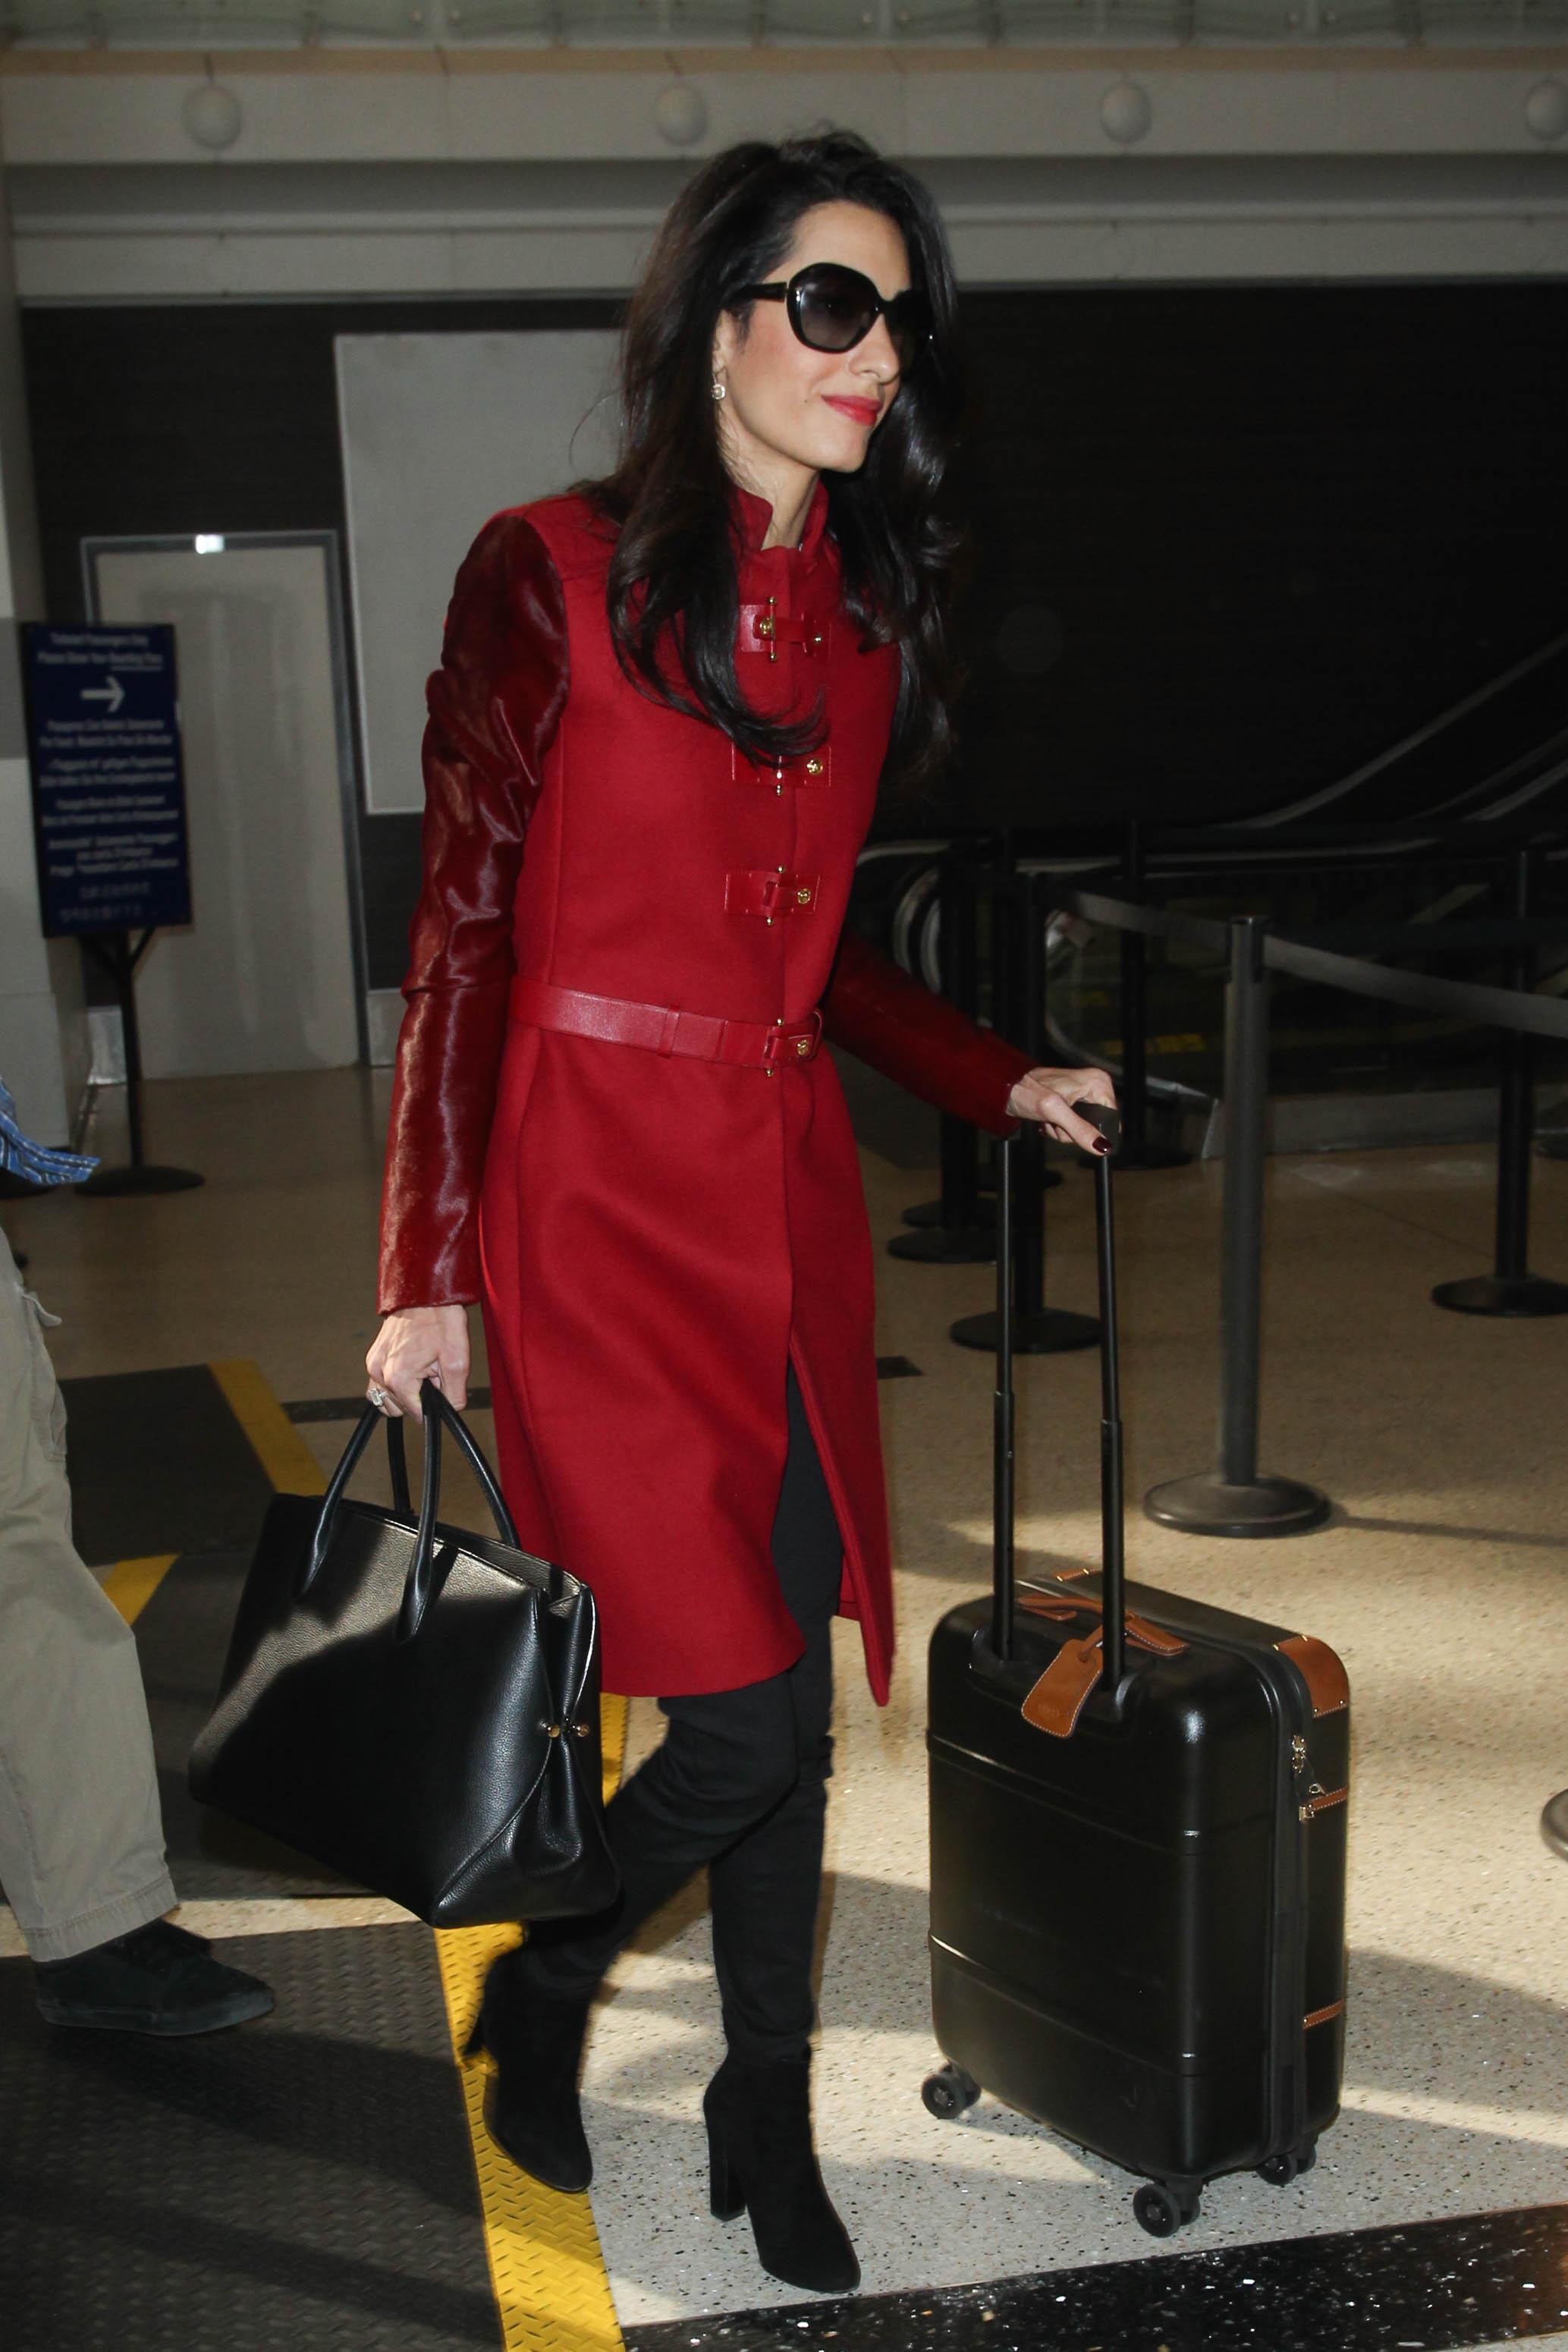 World's best dressed travellers: Victoria Beckham, Amal Clooney